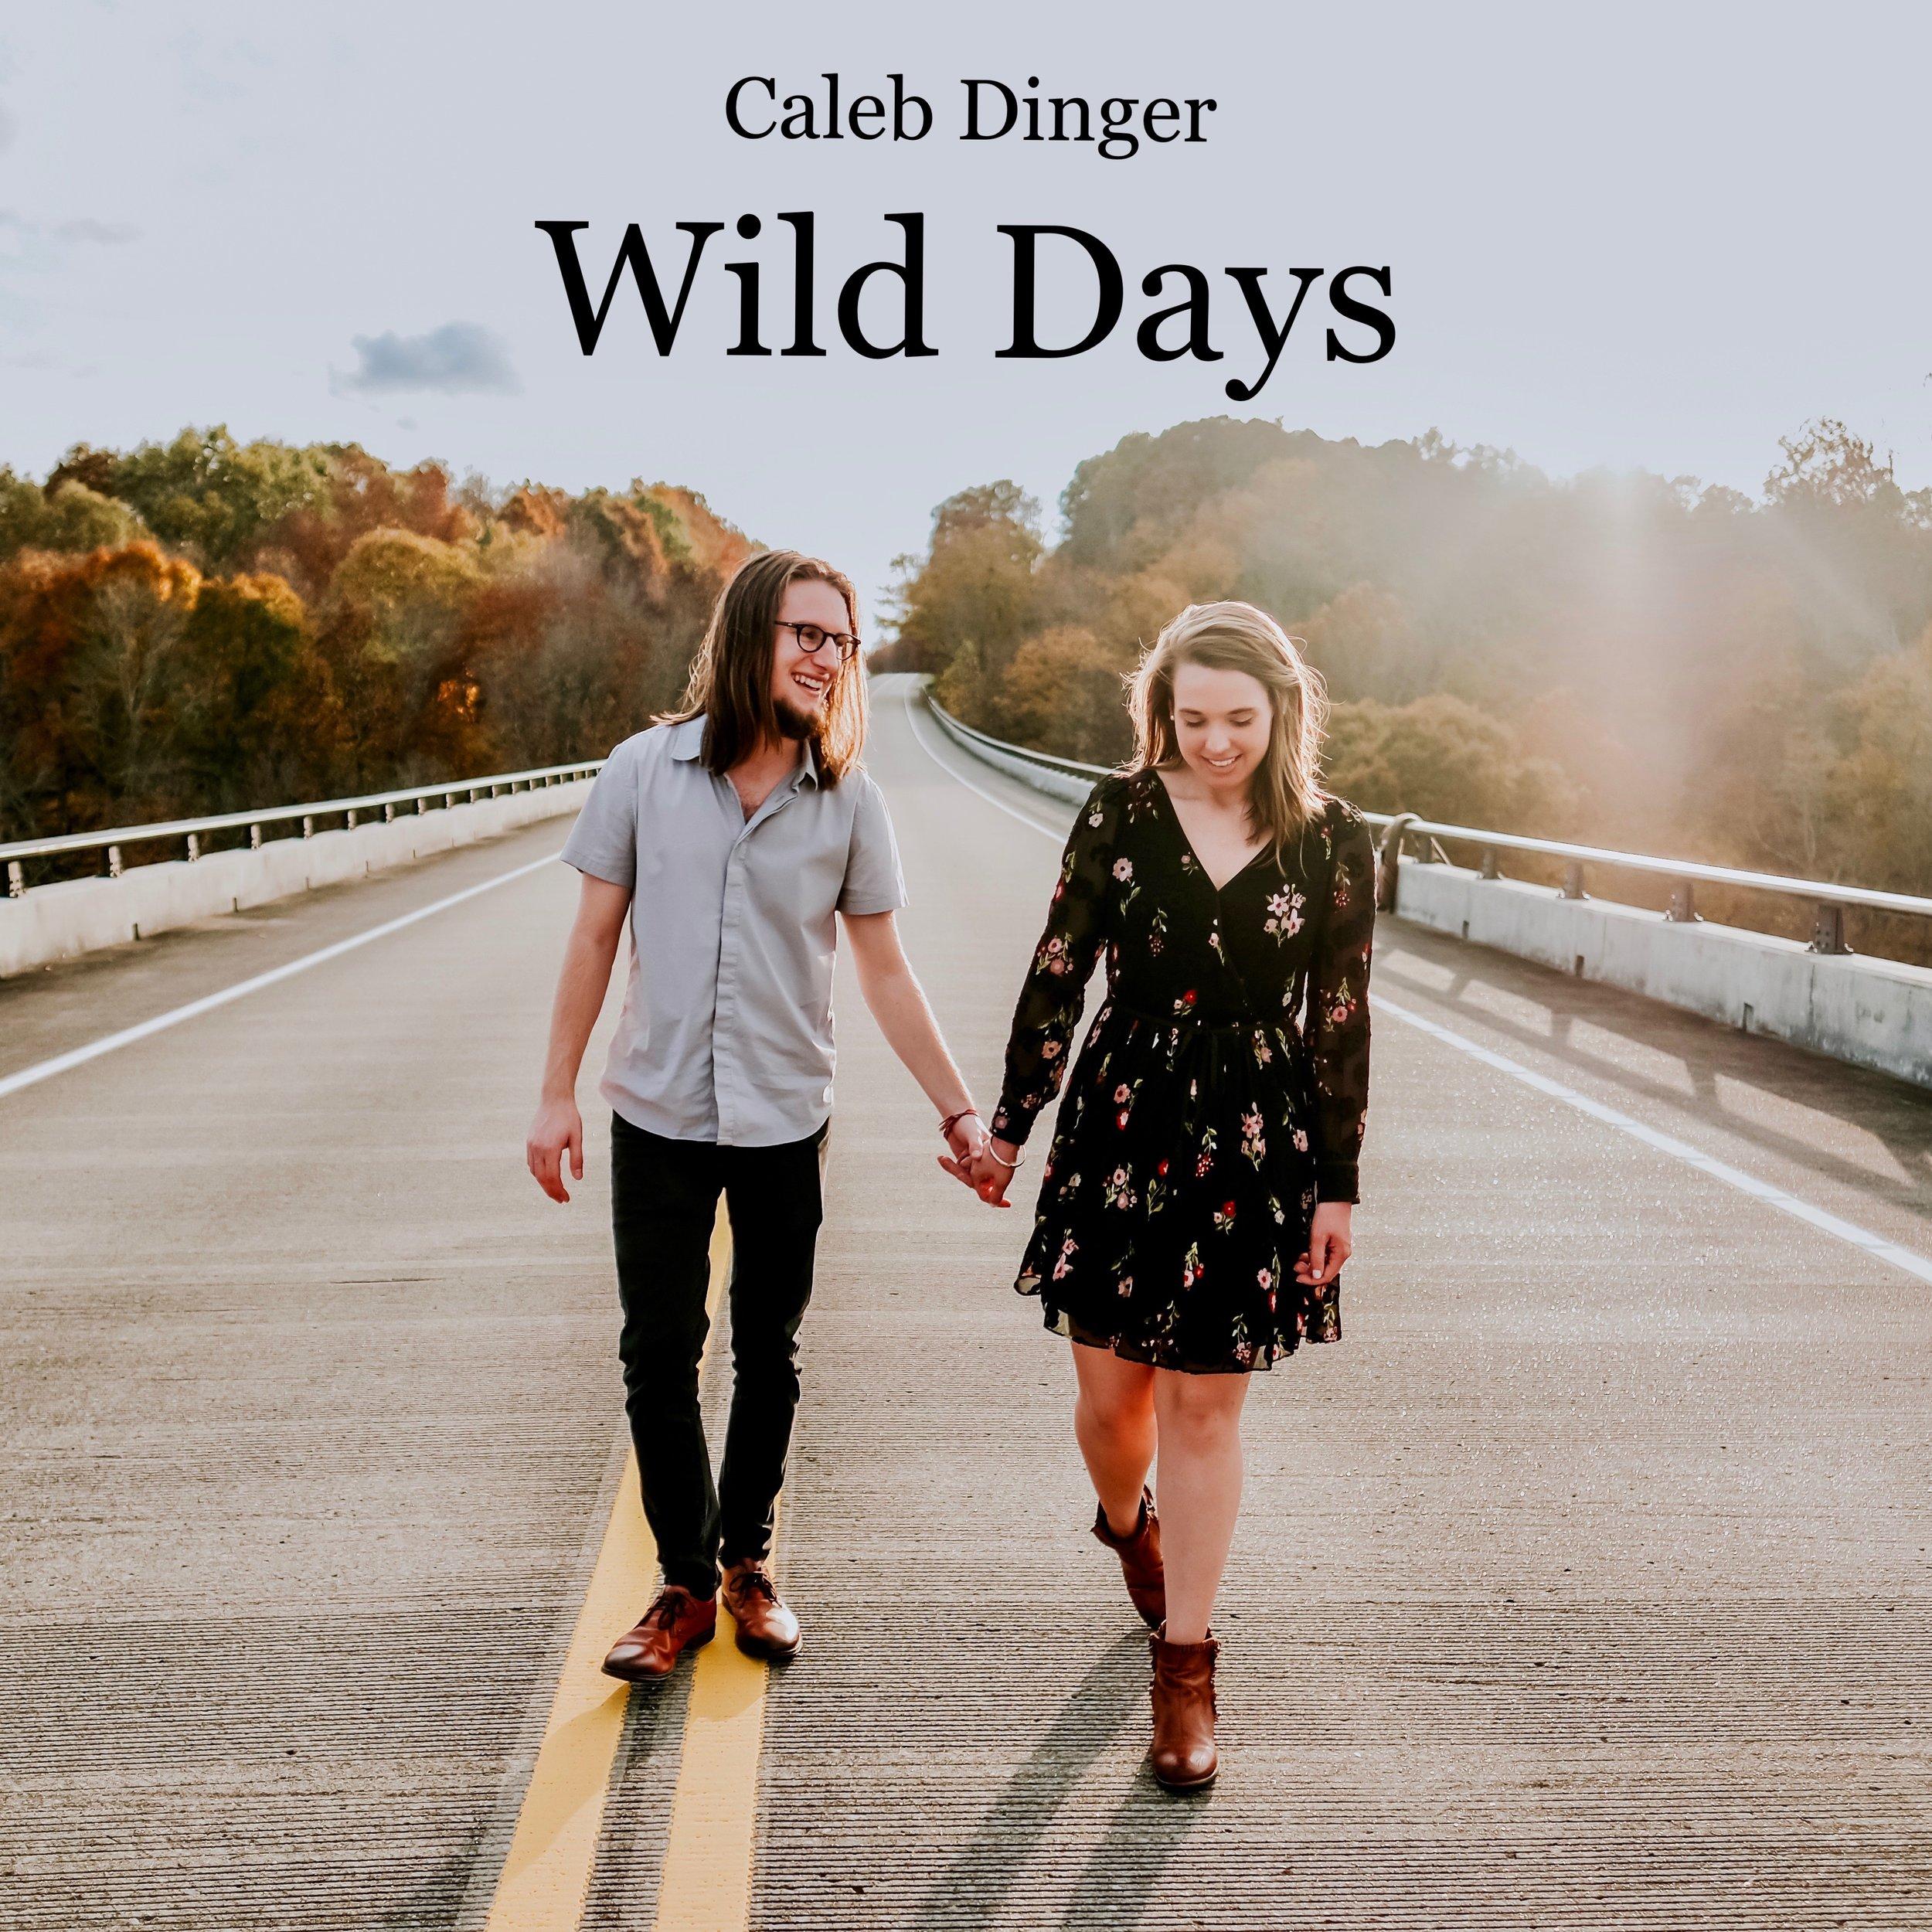 Wild Days Album Cover.jpg